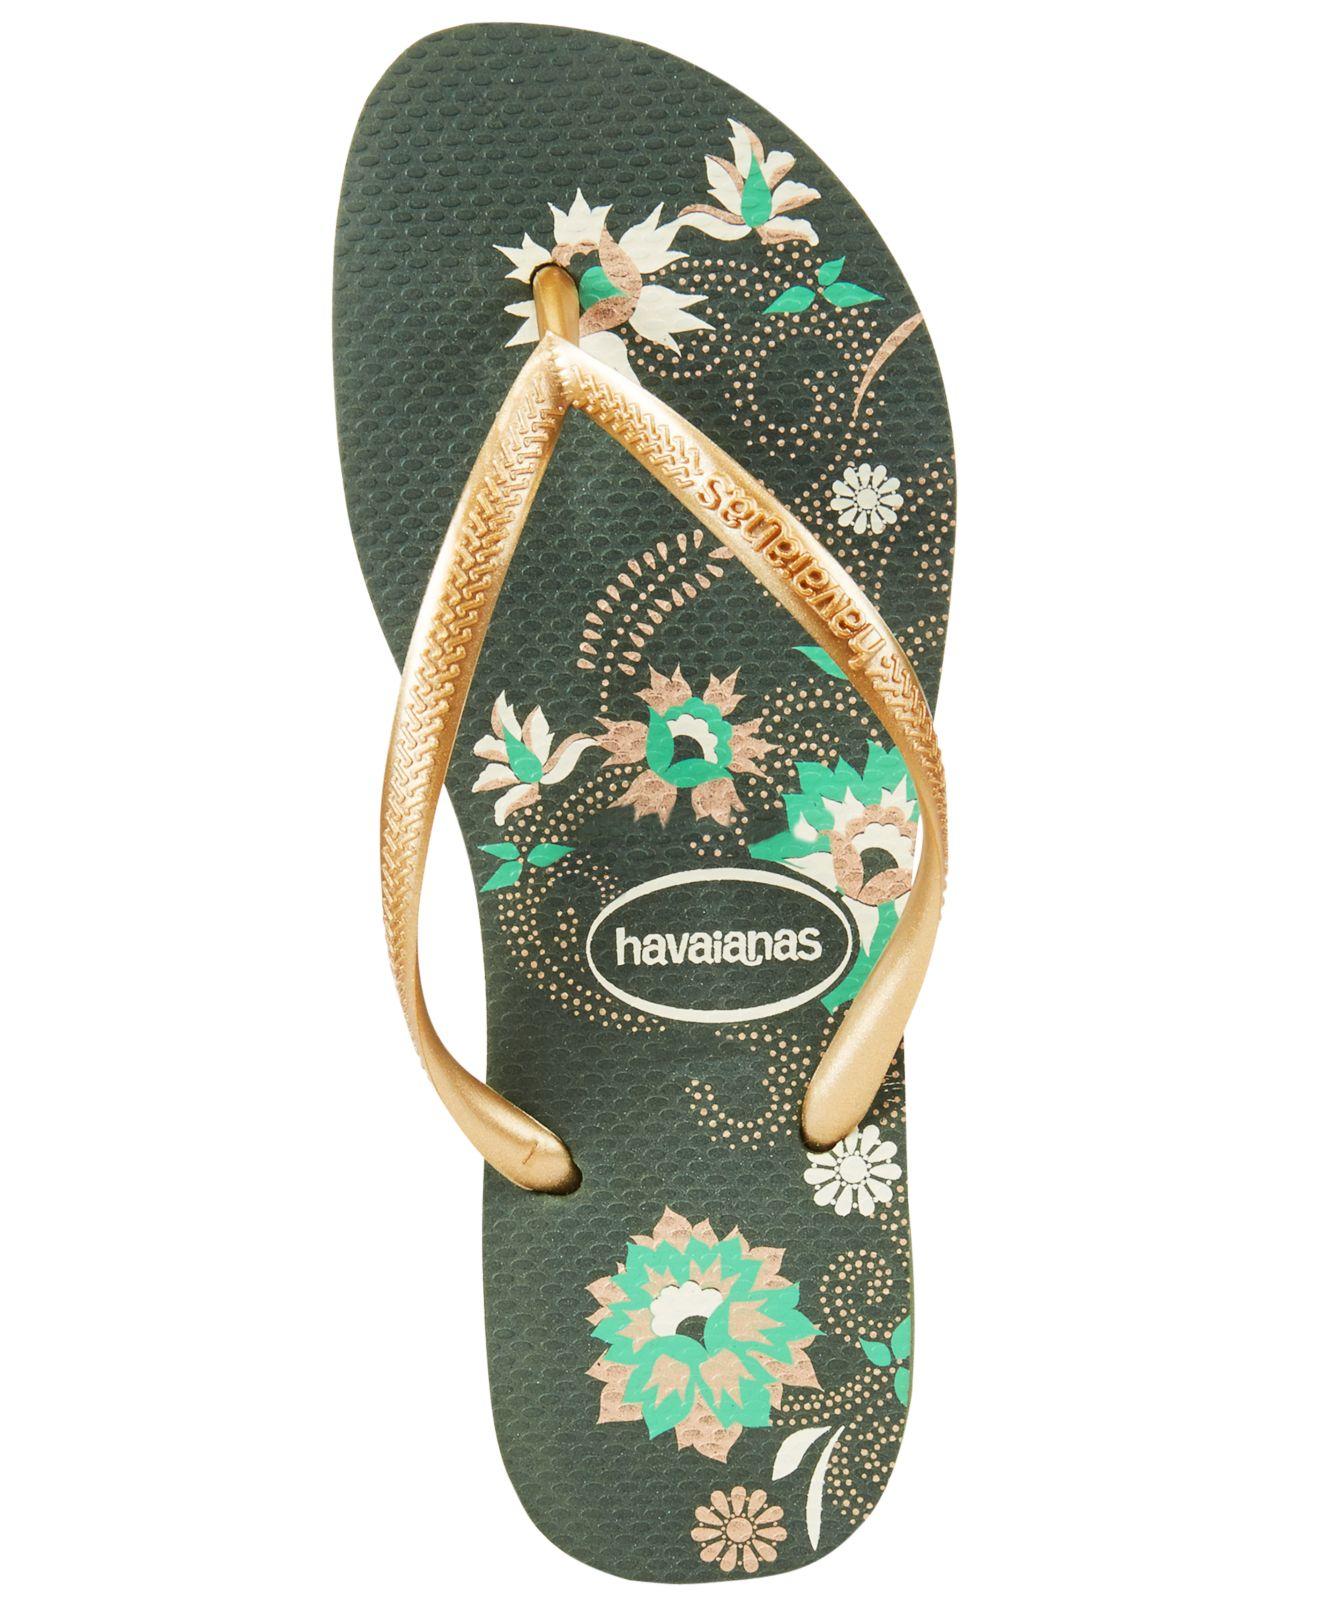 Havaianas Womens Slim Organic Flip-Flop Sandals In Black -2068